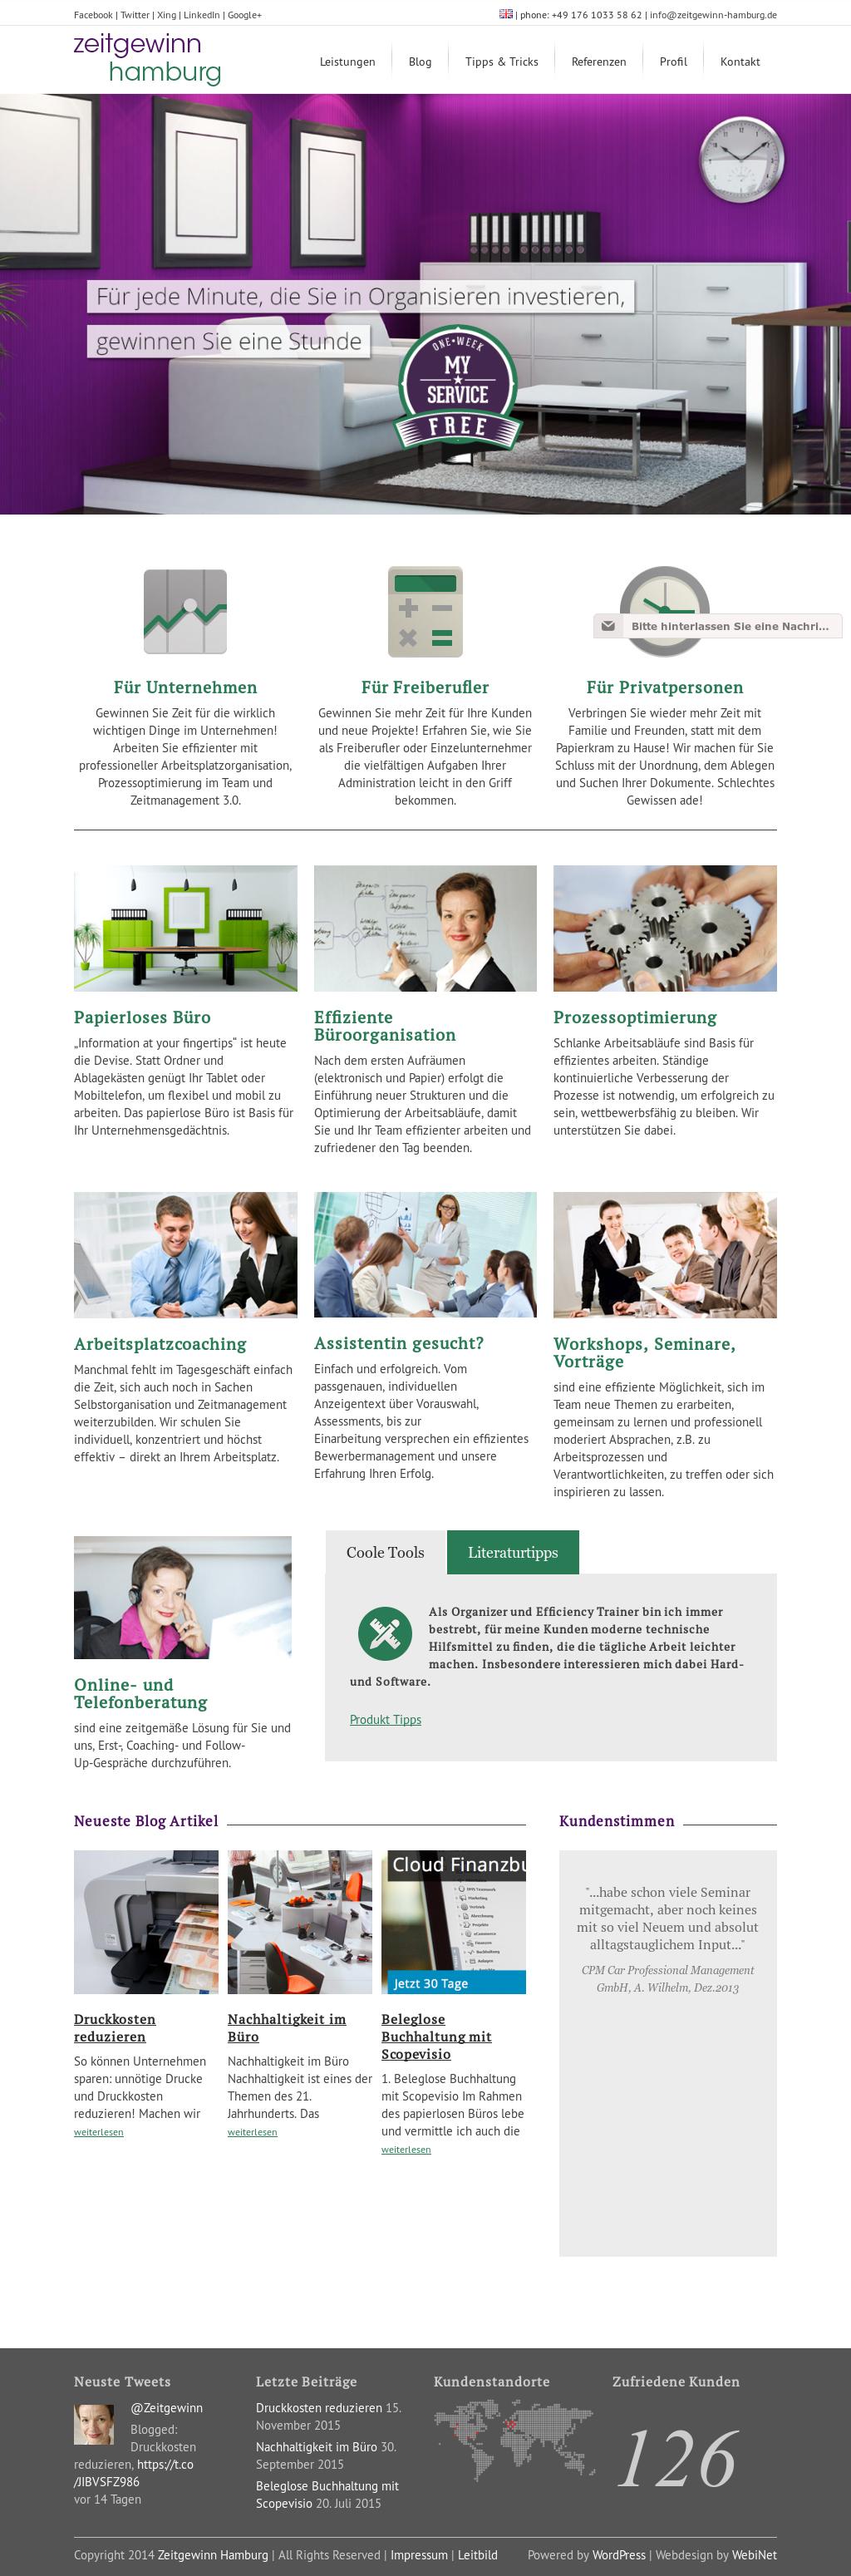 Zeitgewinn Hamburg Competitors, Revenue and Employees - Owler ...